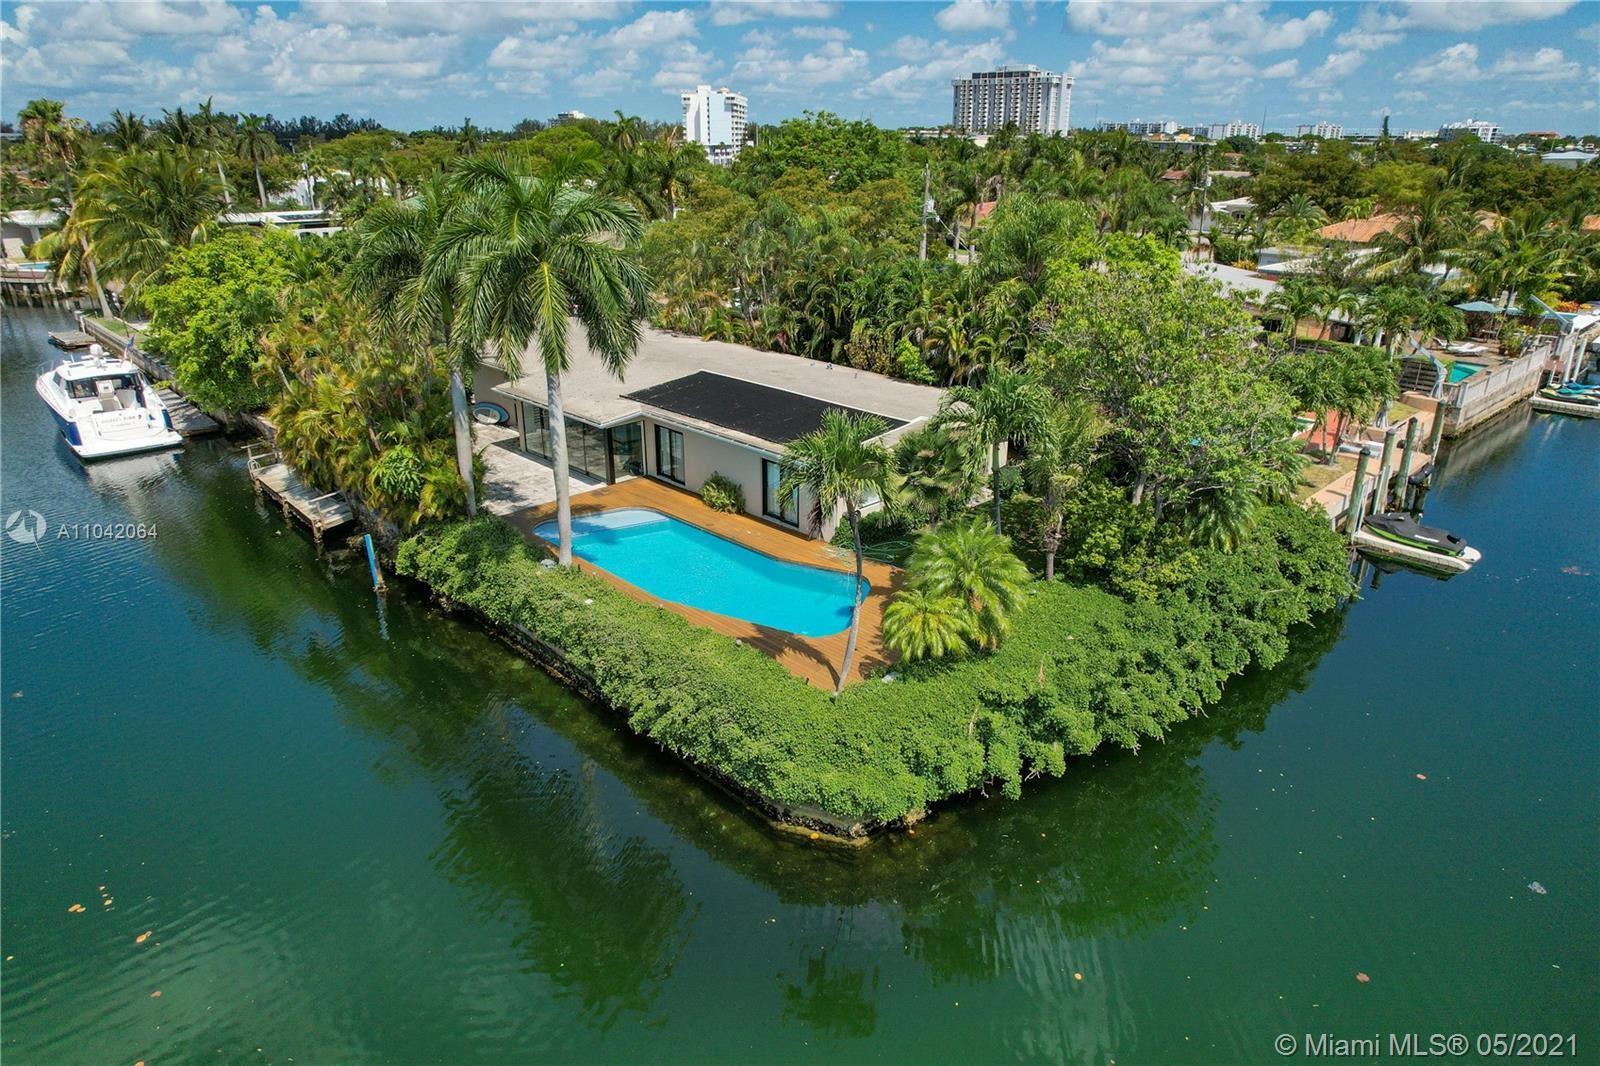 12901 Oleander Rd, North Miami, FL 33181 - #: A11042064